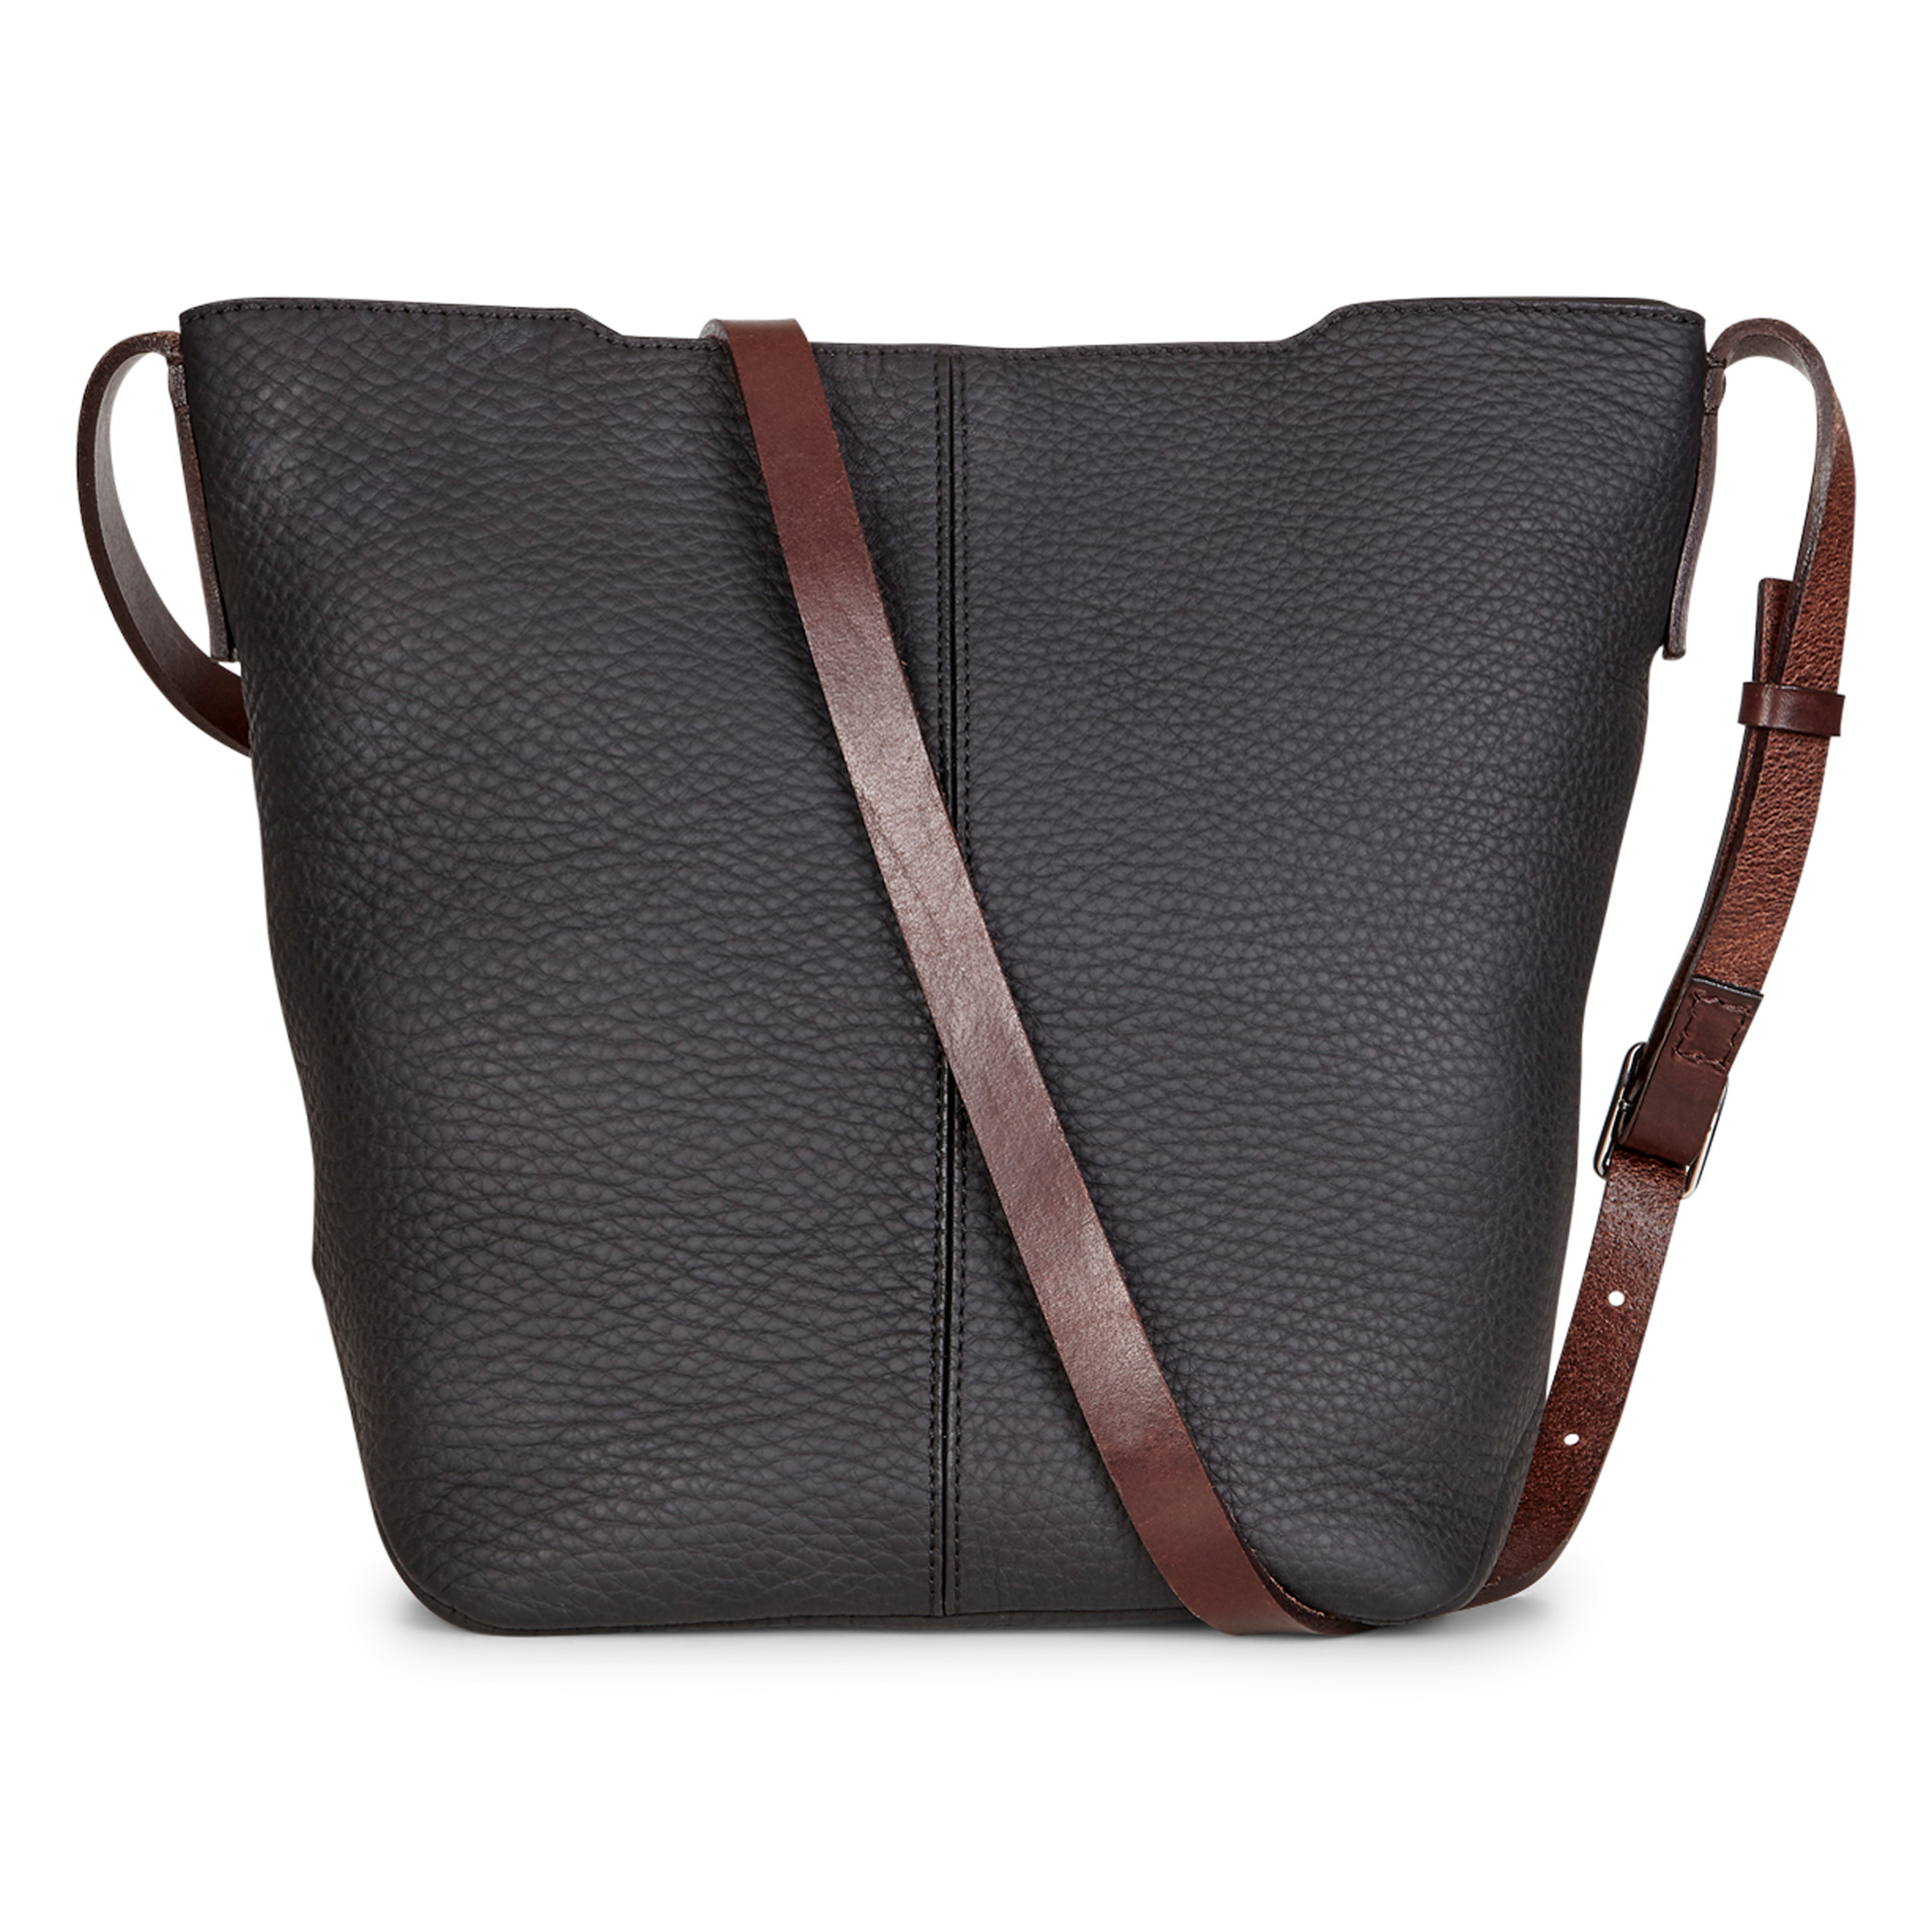 Image of ECCO Jilin Bucket Bag